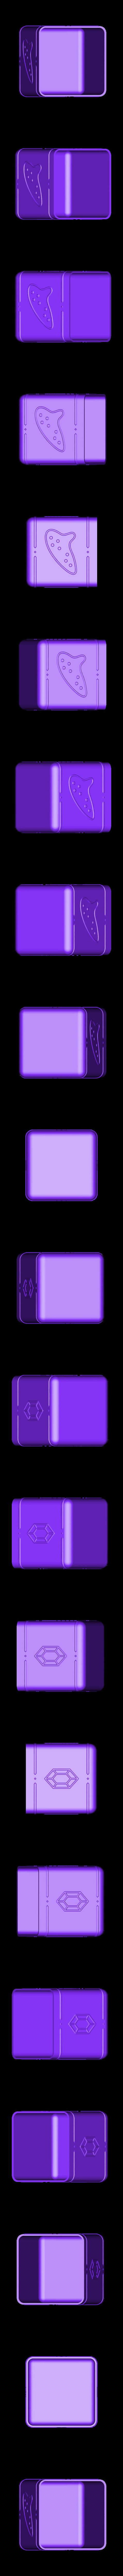 planter_zelda_single_noholes.stl Download free STL file Video Game Planter Collection • Object to 3D print, flowalistik